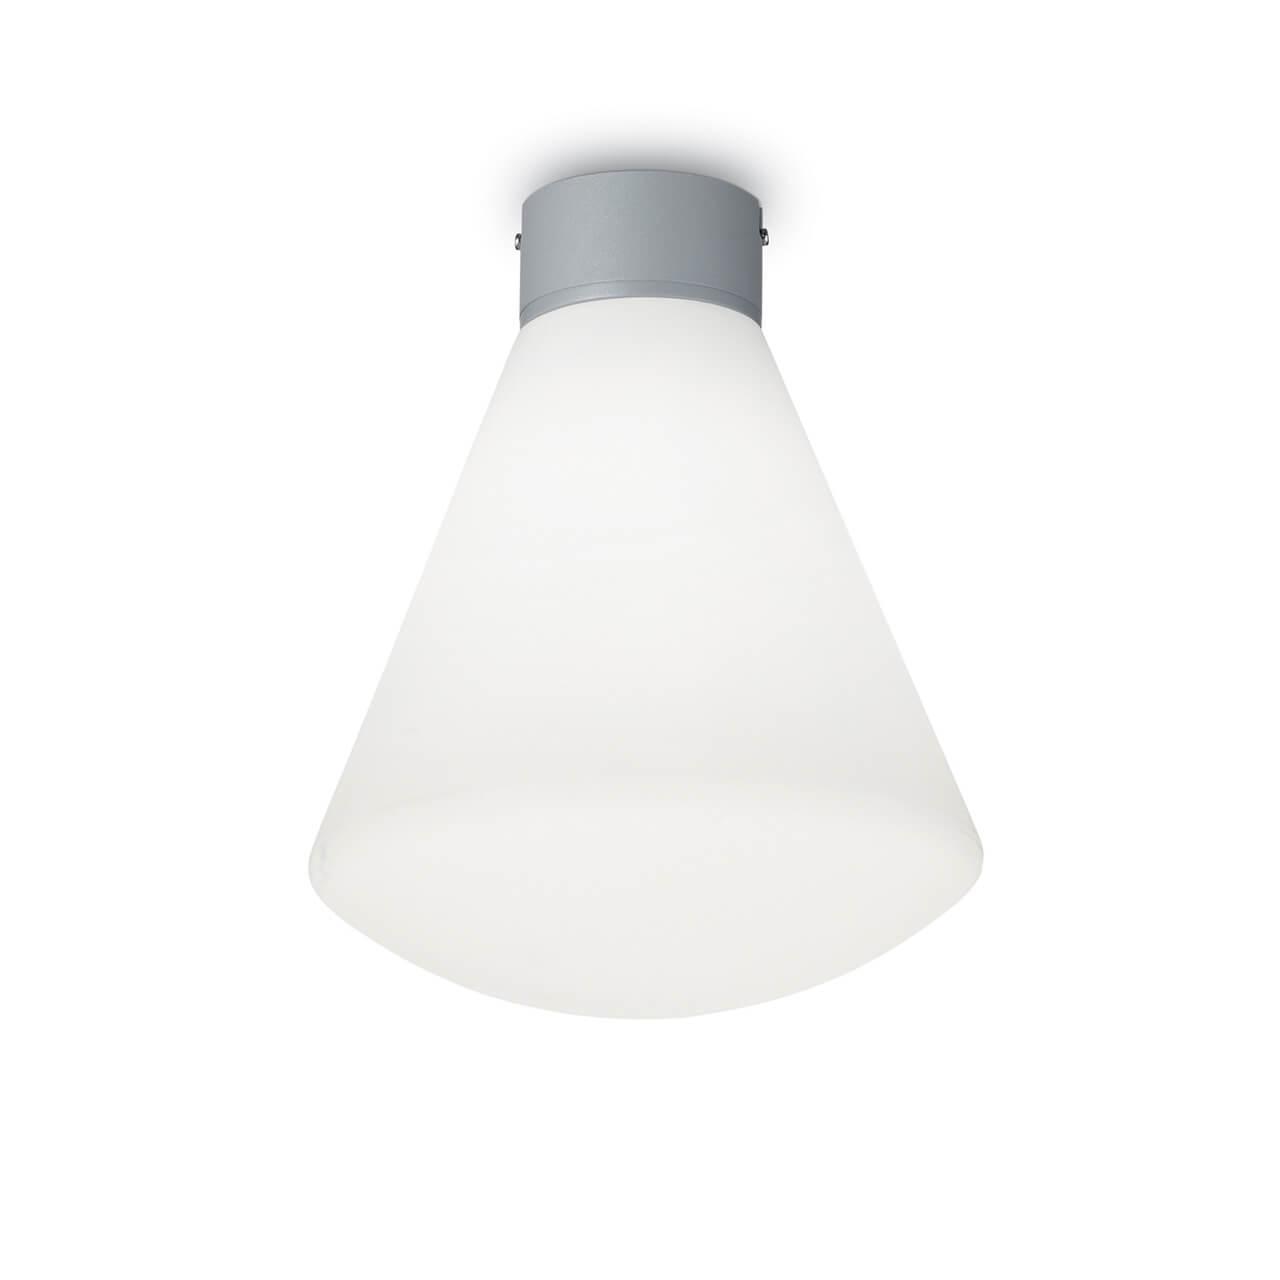 Уличный светильник Ideal Lux Ouverture PL1 Grigio